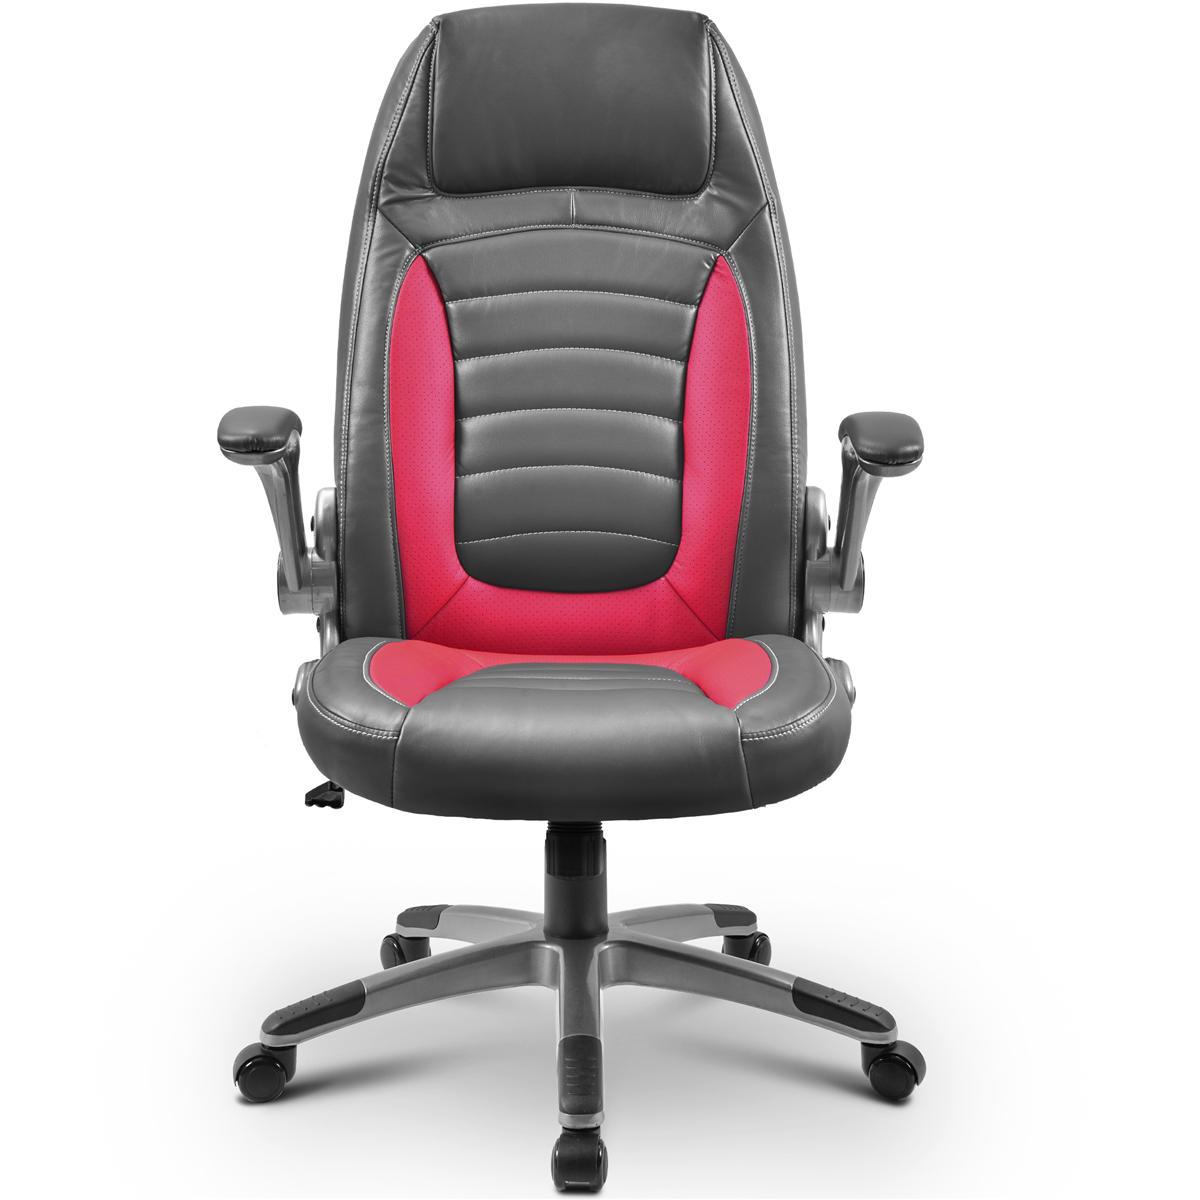 Ergonomic Office Chair HighBack Rotating Lift Modern Computer